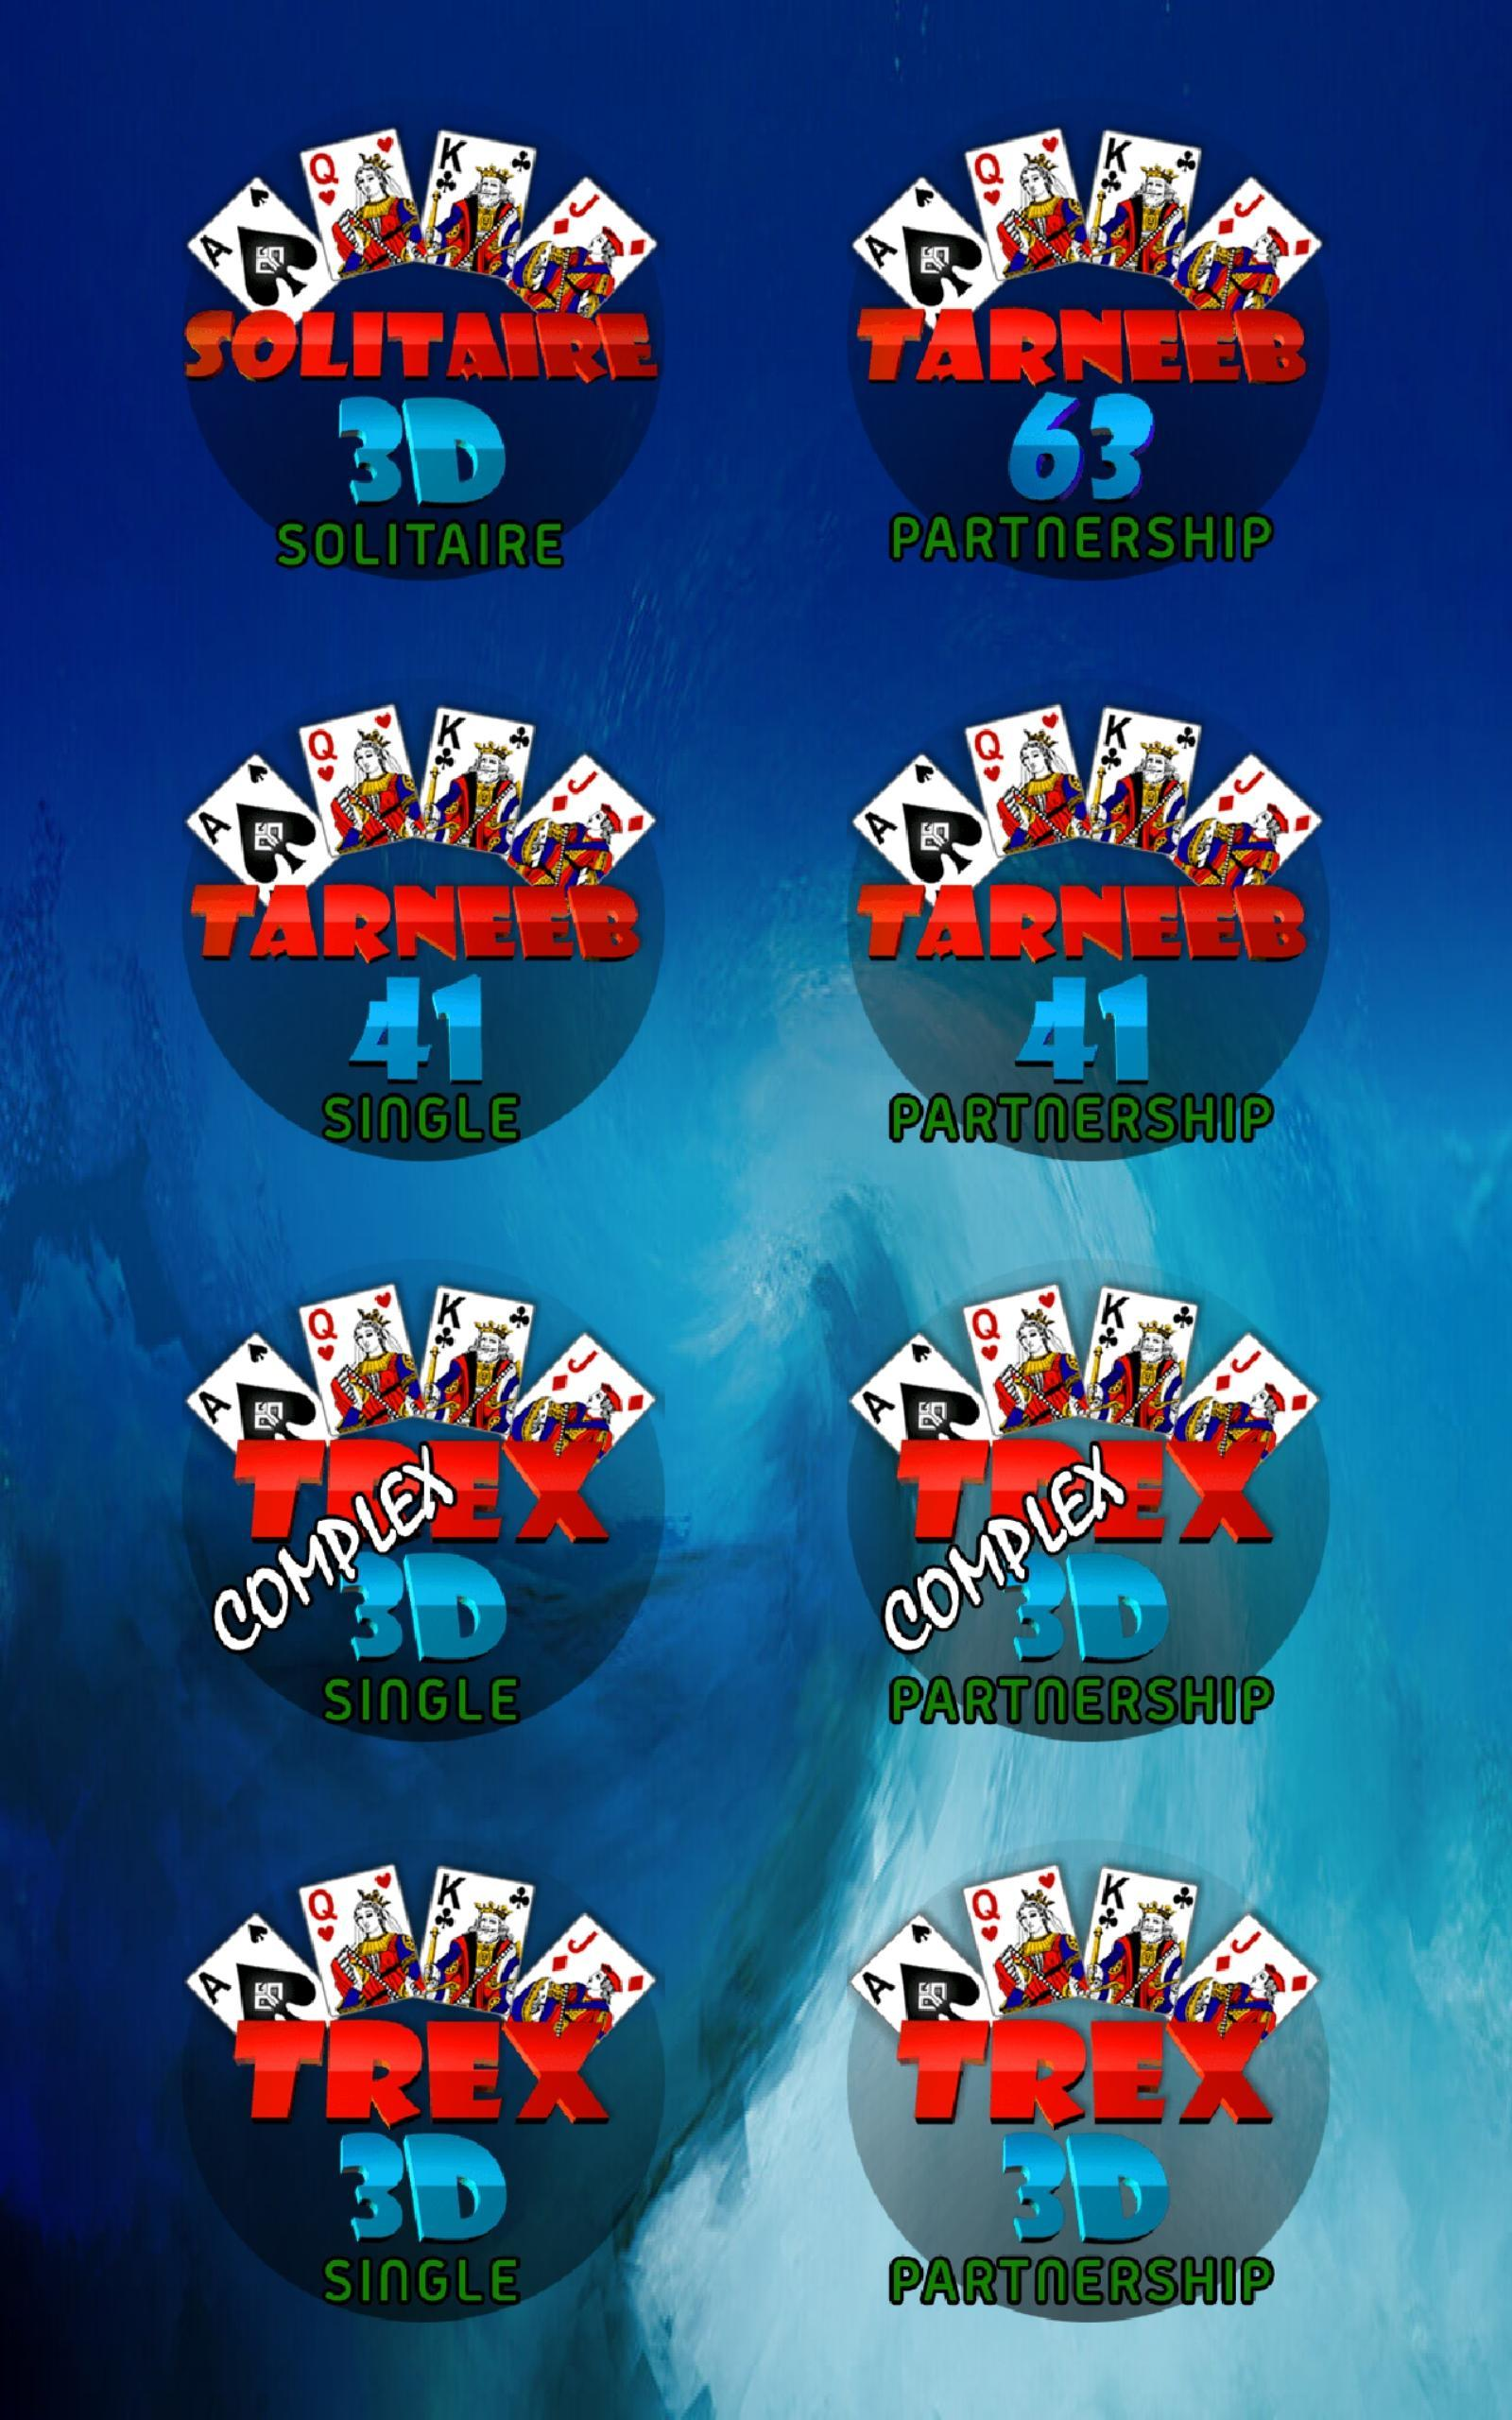 Golden Card Games (Tarneeb - Trix - Solitaire) 20.1.1.30 Screenshot 8